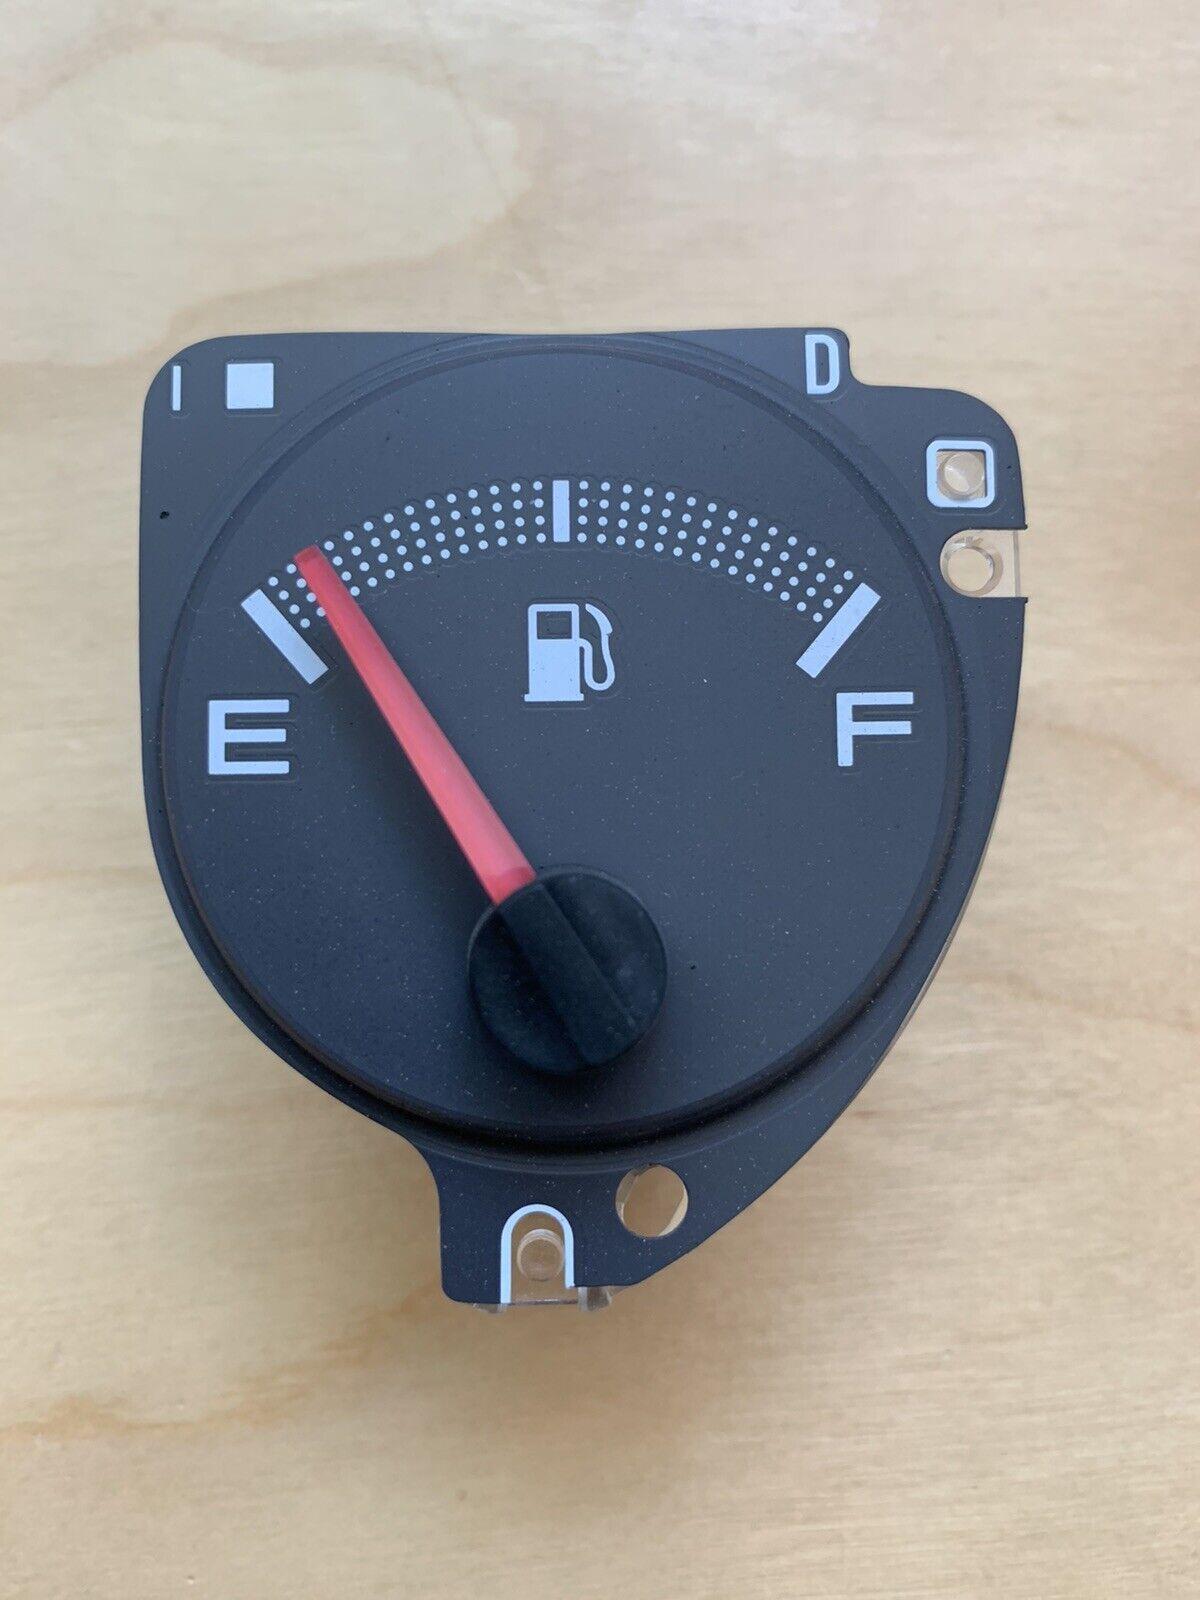 Acura 78130-ST7-701 Fuel Level Gauge